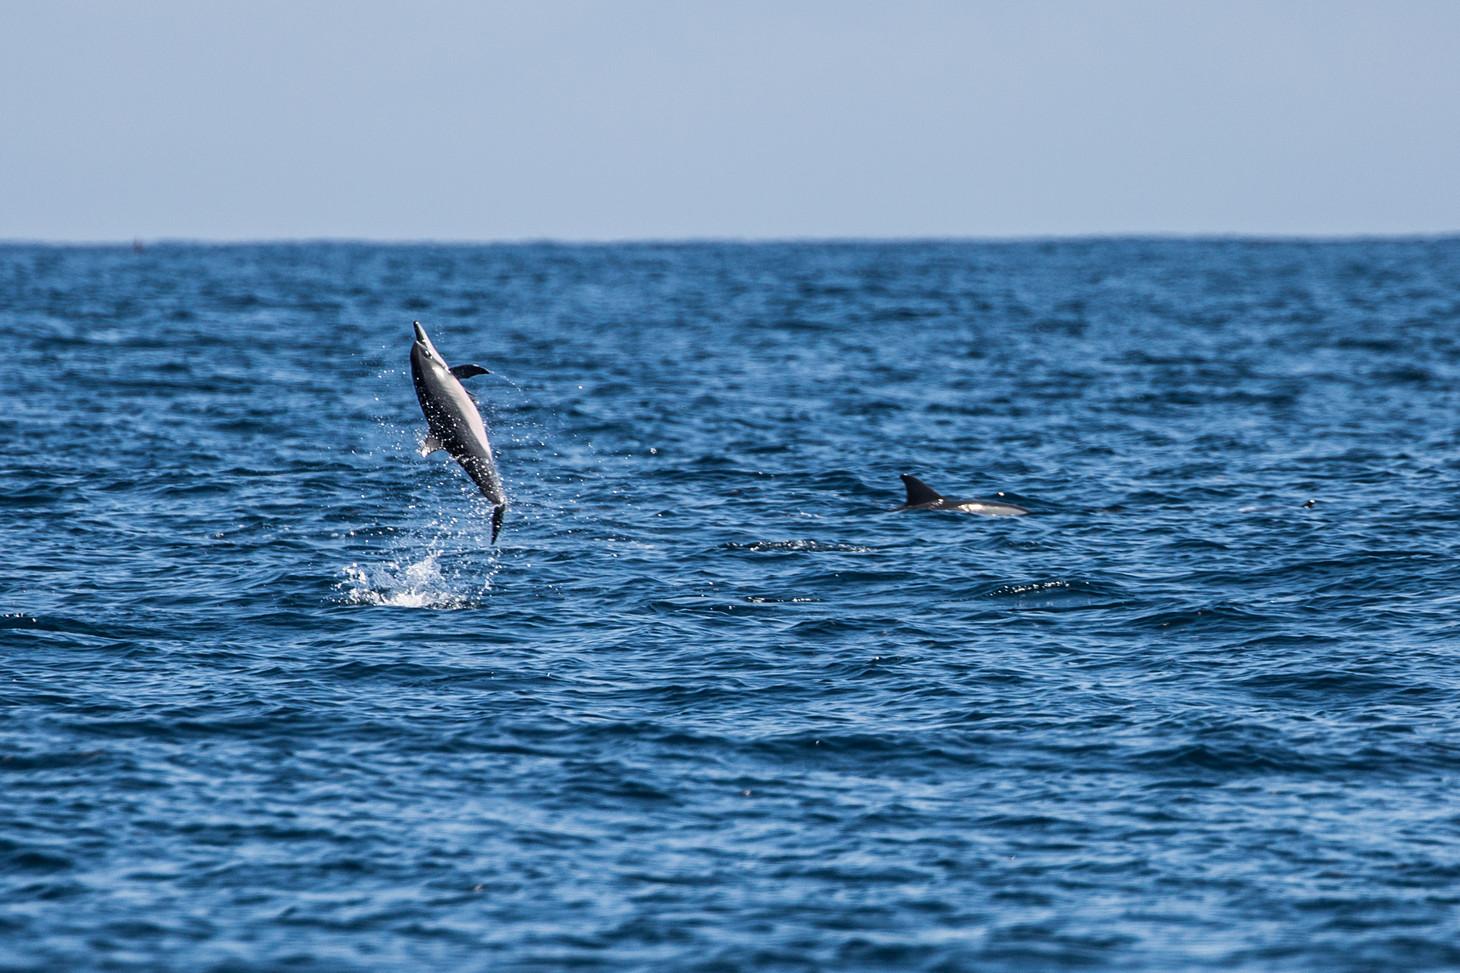 Tanzania - Fanjove Island - Dolphinshin spin